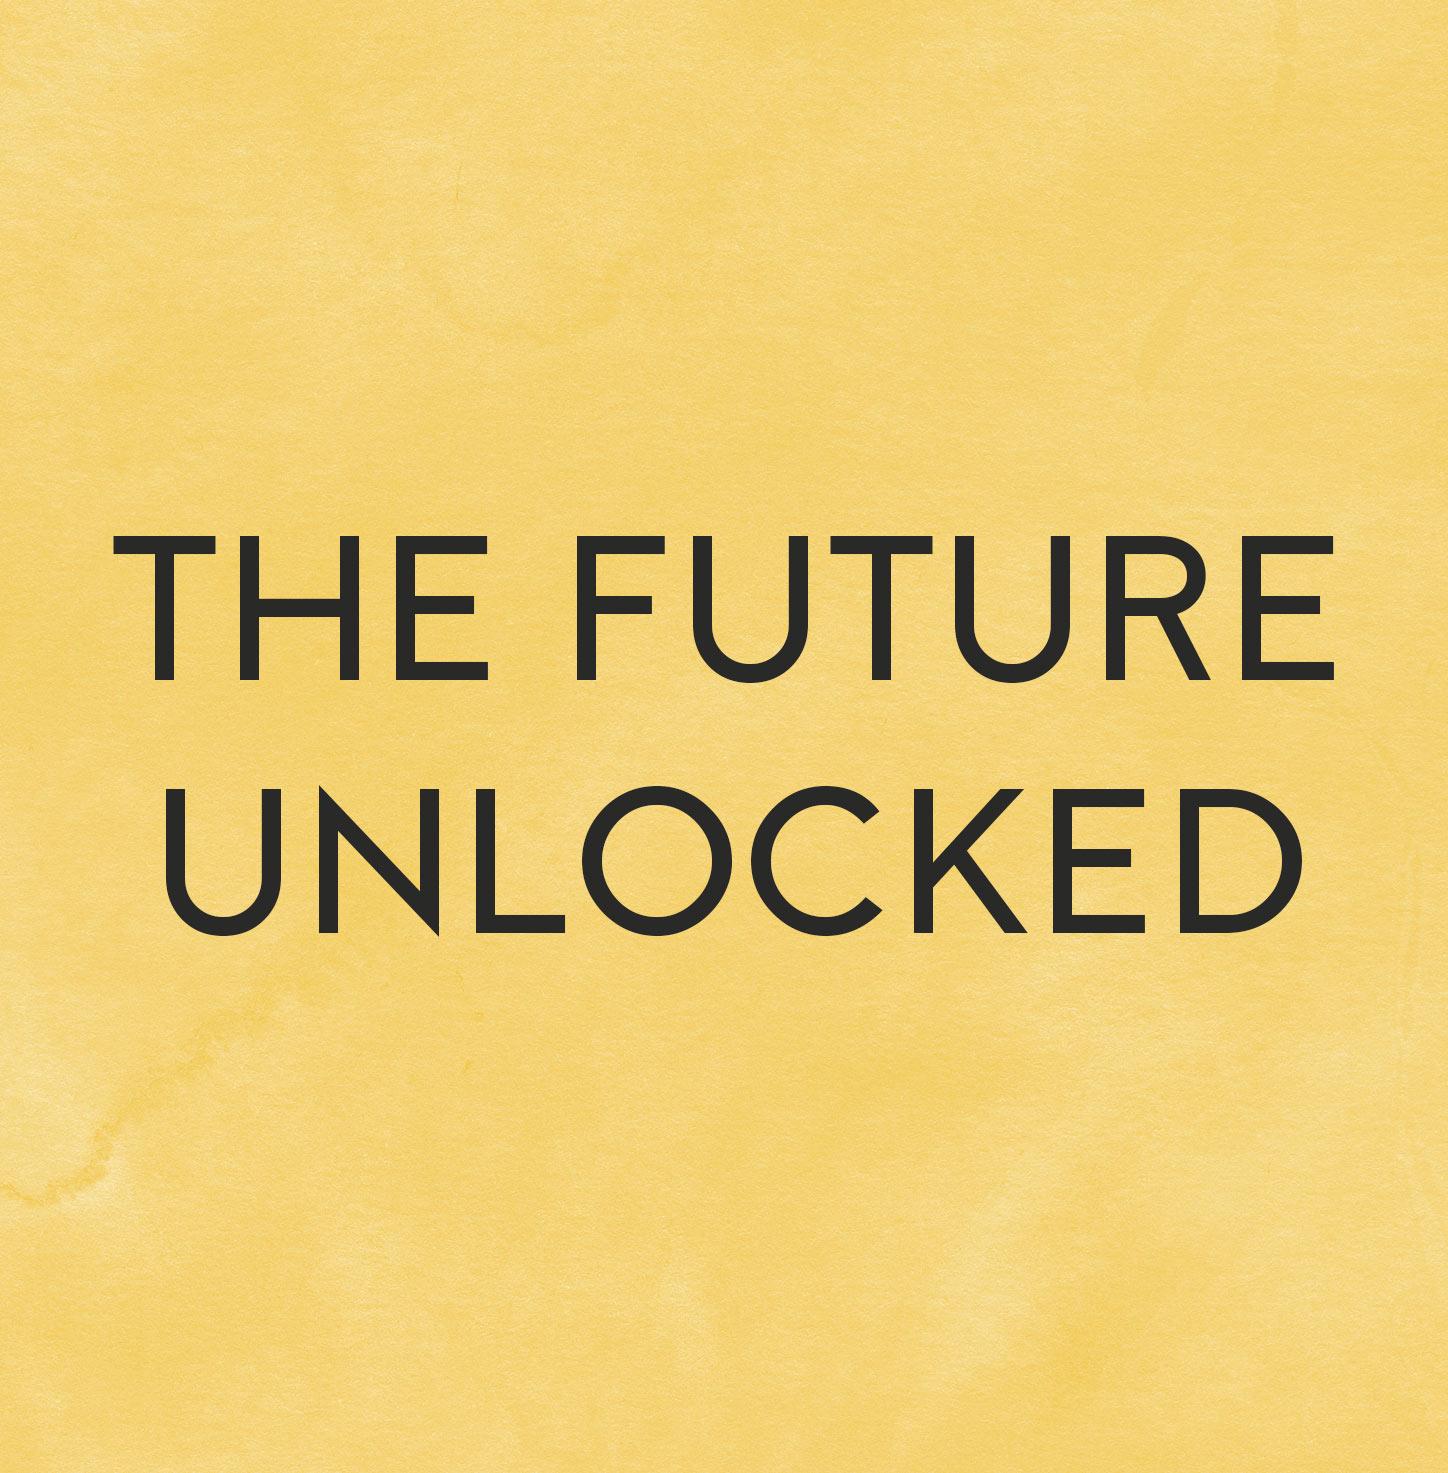 The Future Unlocked